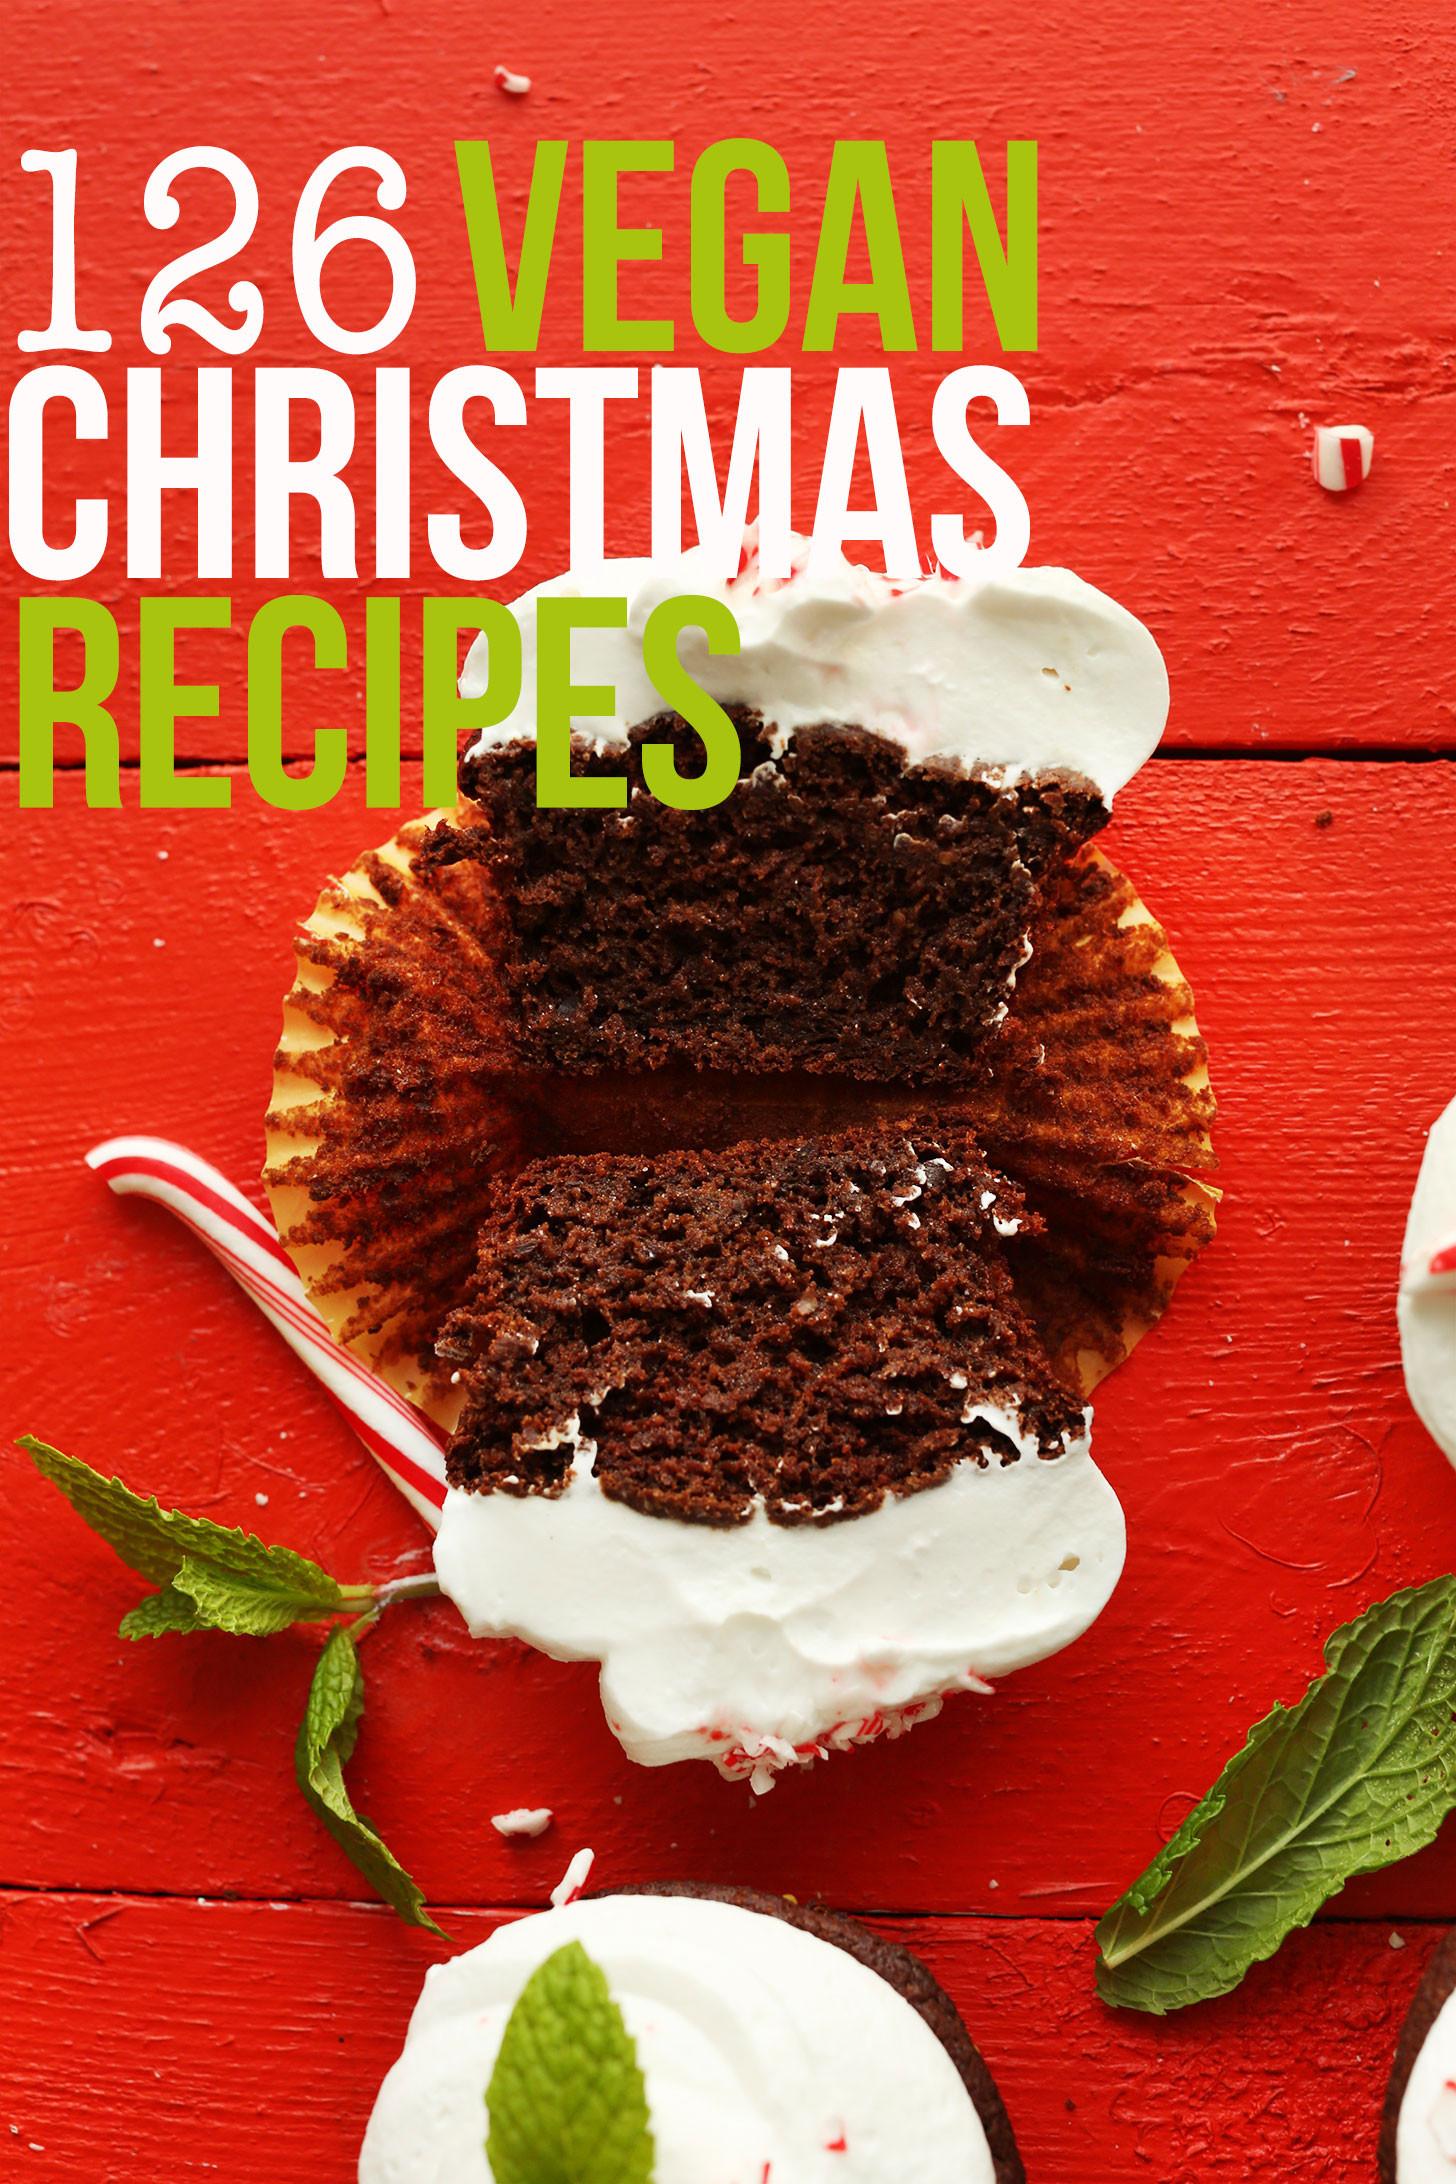 Vegan Christmas Recipes  126 Vegan Christmas Recipes